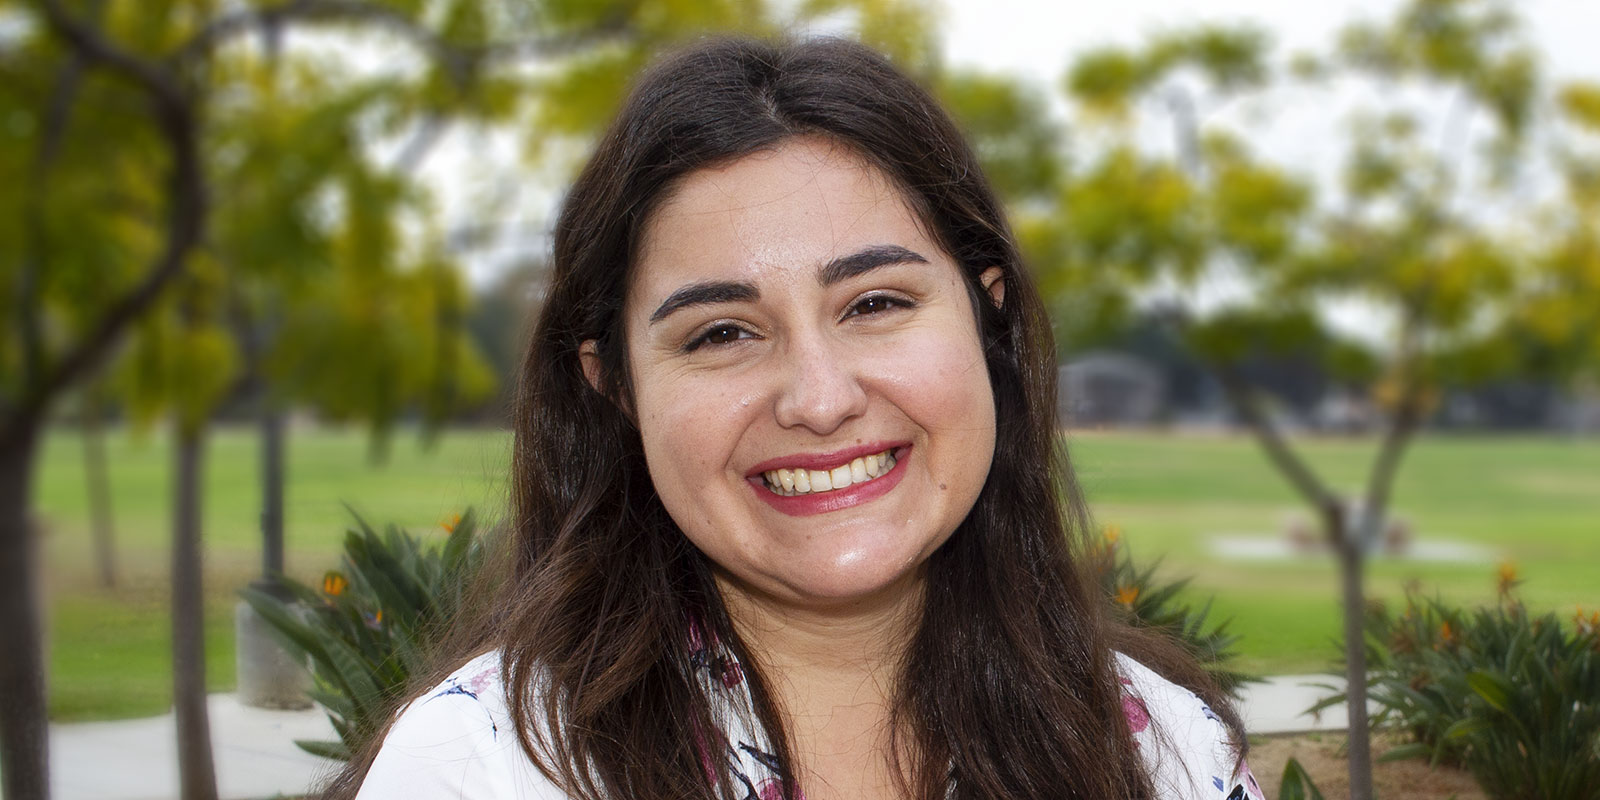 University of San Diego alumna Hannah Otte '19 (BA)